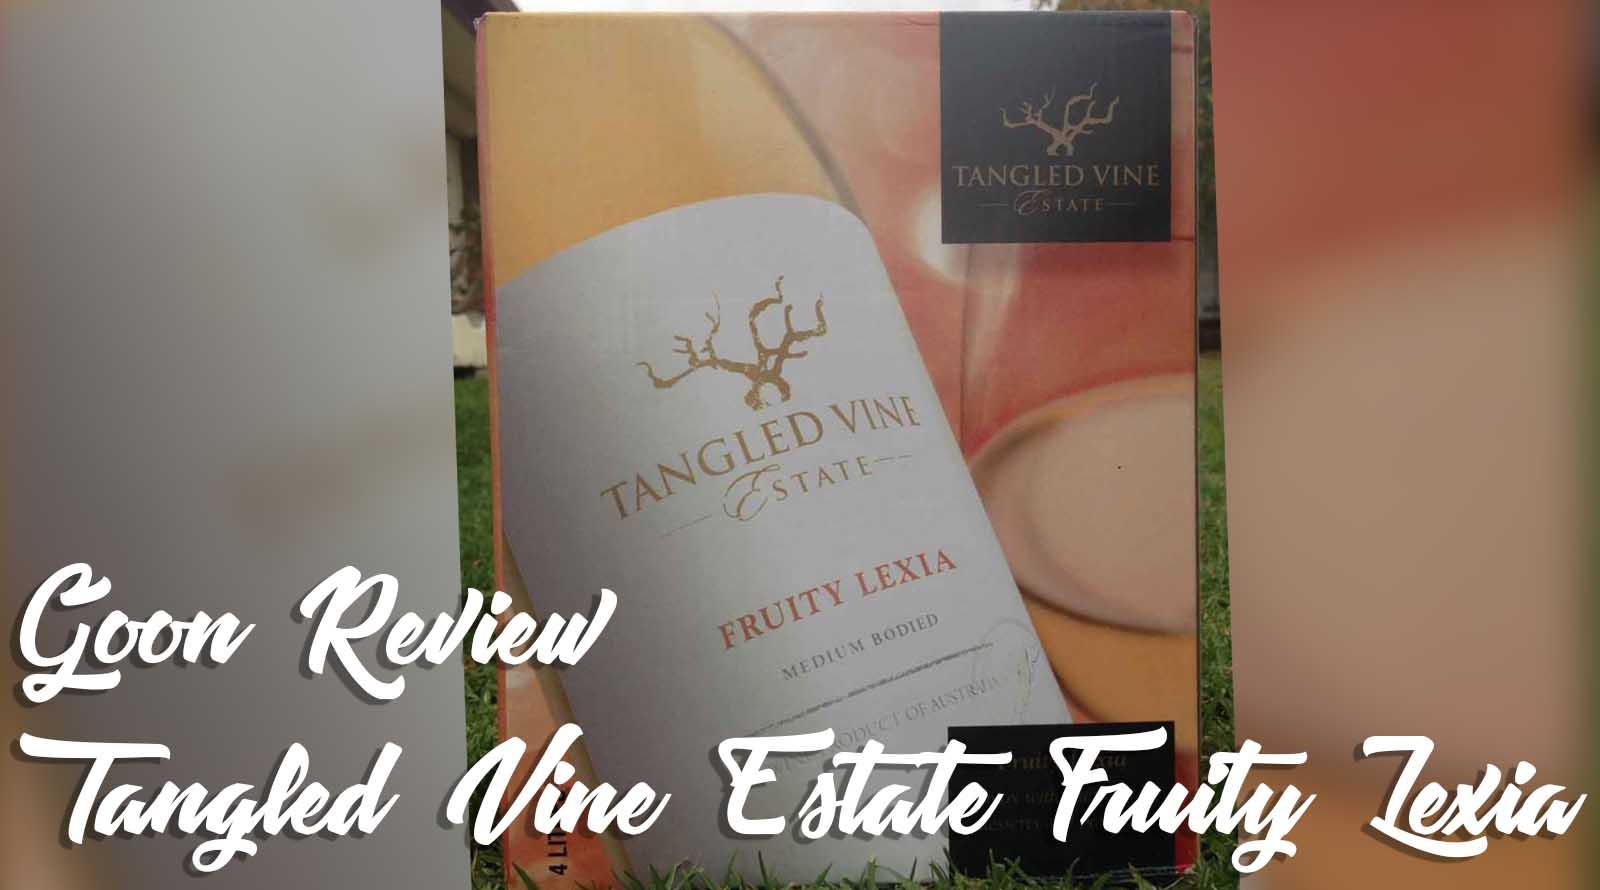 Tangled Vine Estate Fruity Lexia Goon Caskbox Wine Review